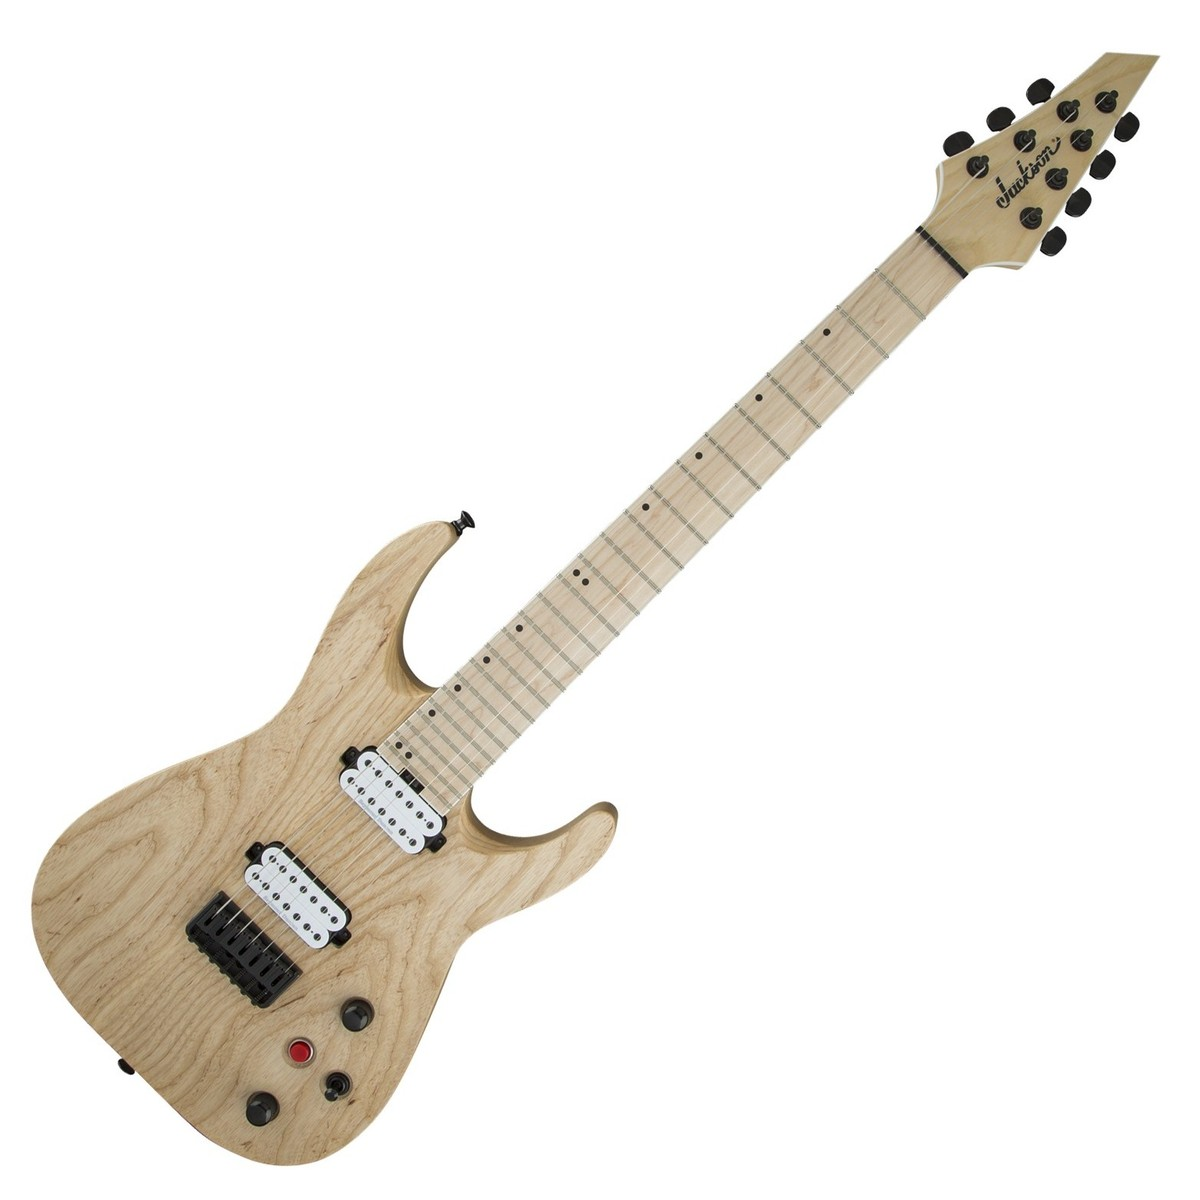 jackson dka7m pro series dinky 7 string electric guitar natural music machine musical. Black Bedroom Furniture Sets. Home Design Ideas